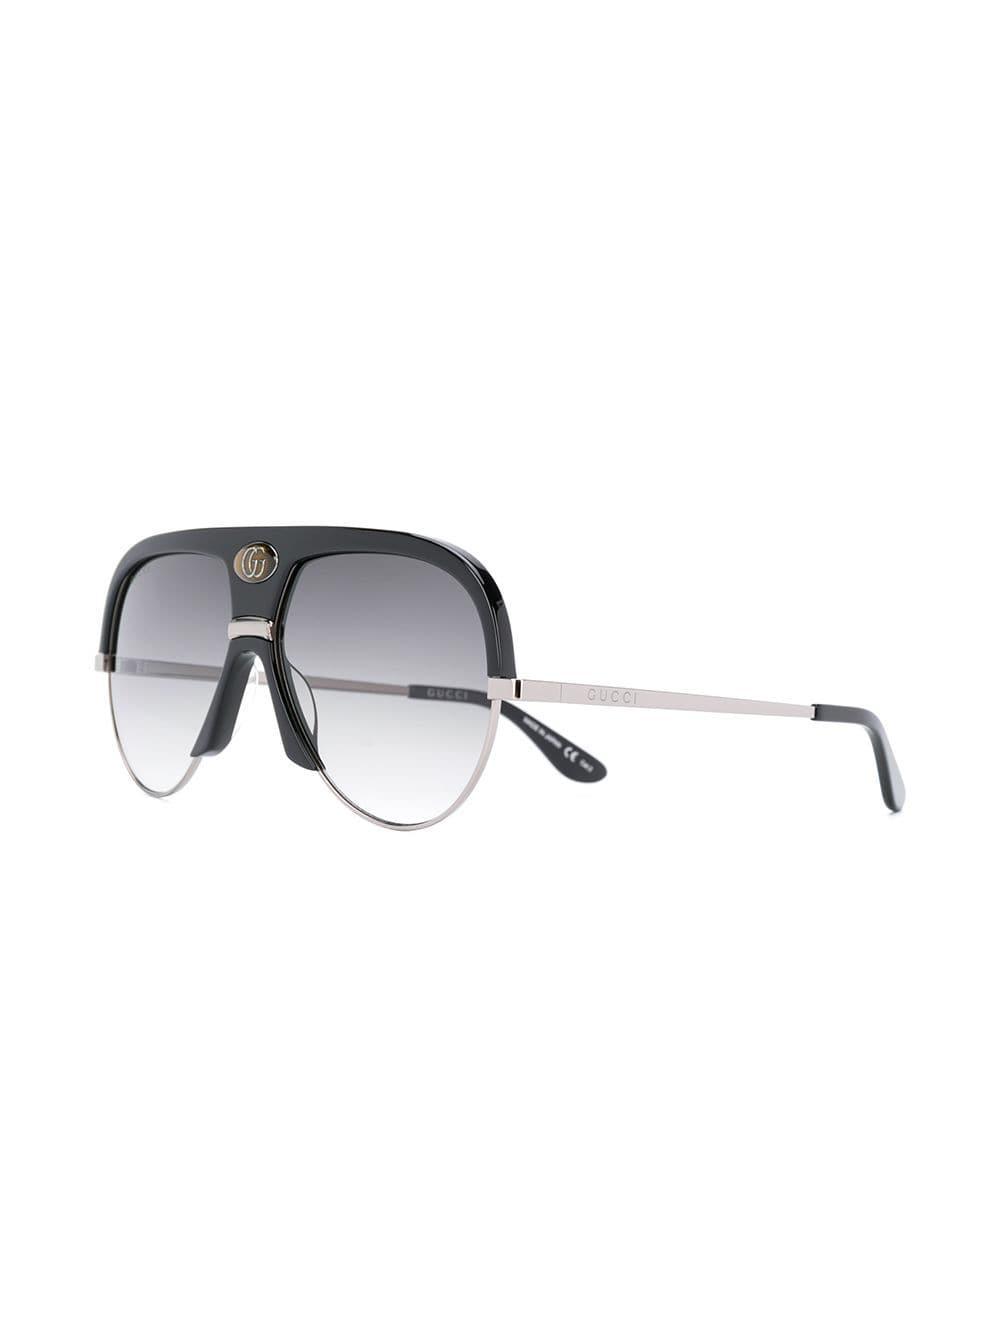 b53f4eeefb0 Gucci - Black Oversized Aviator Frame Sunglasses - Lyst. View fullscreen